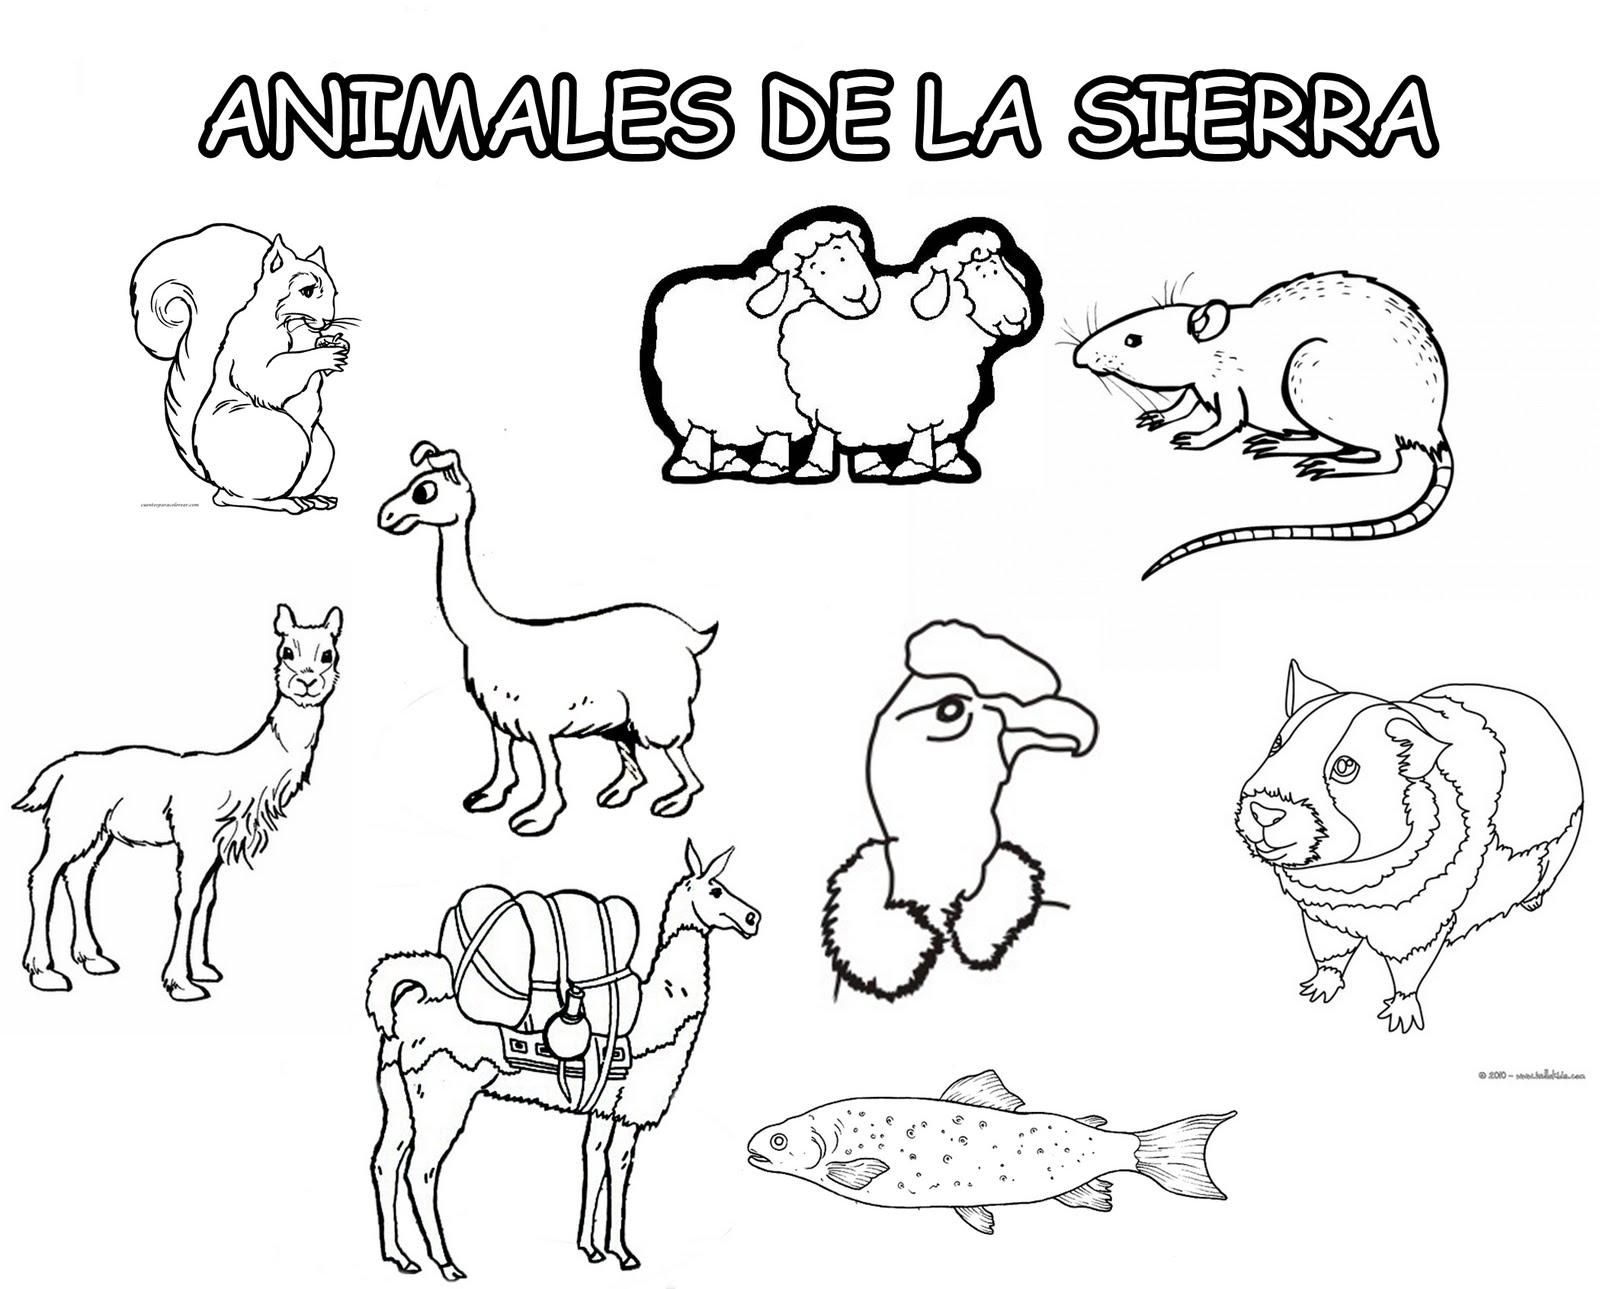 Animales de la sierra peruana para colorear - Imagui